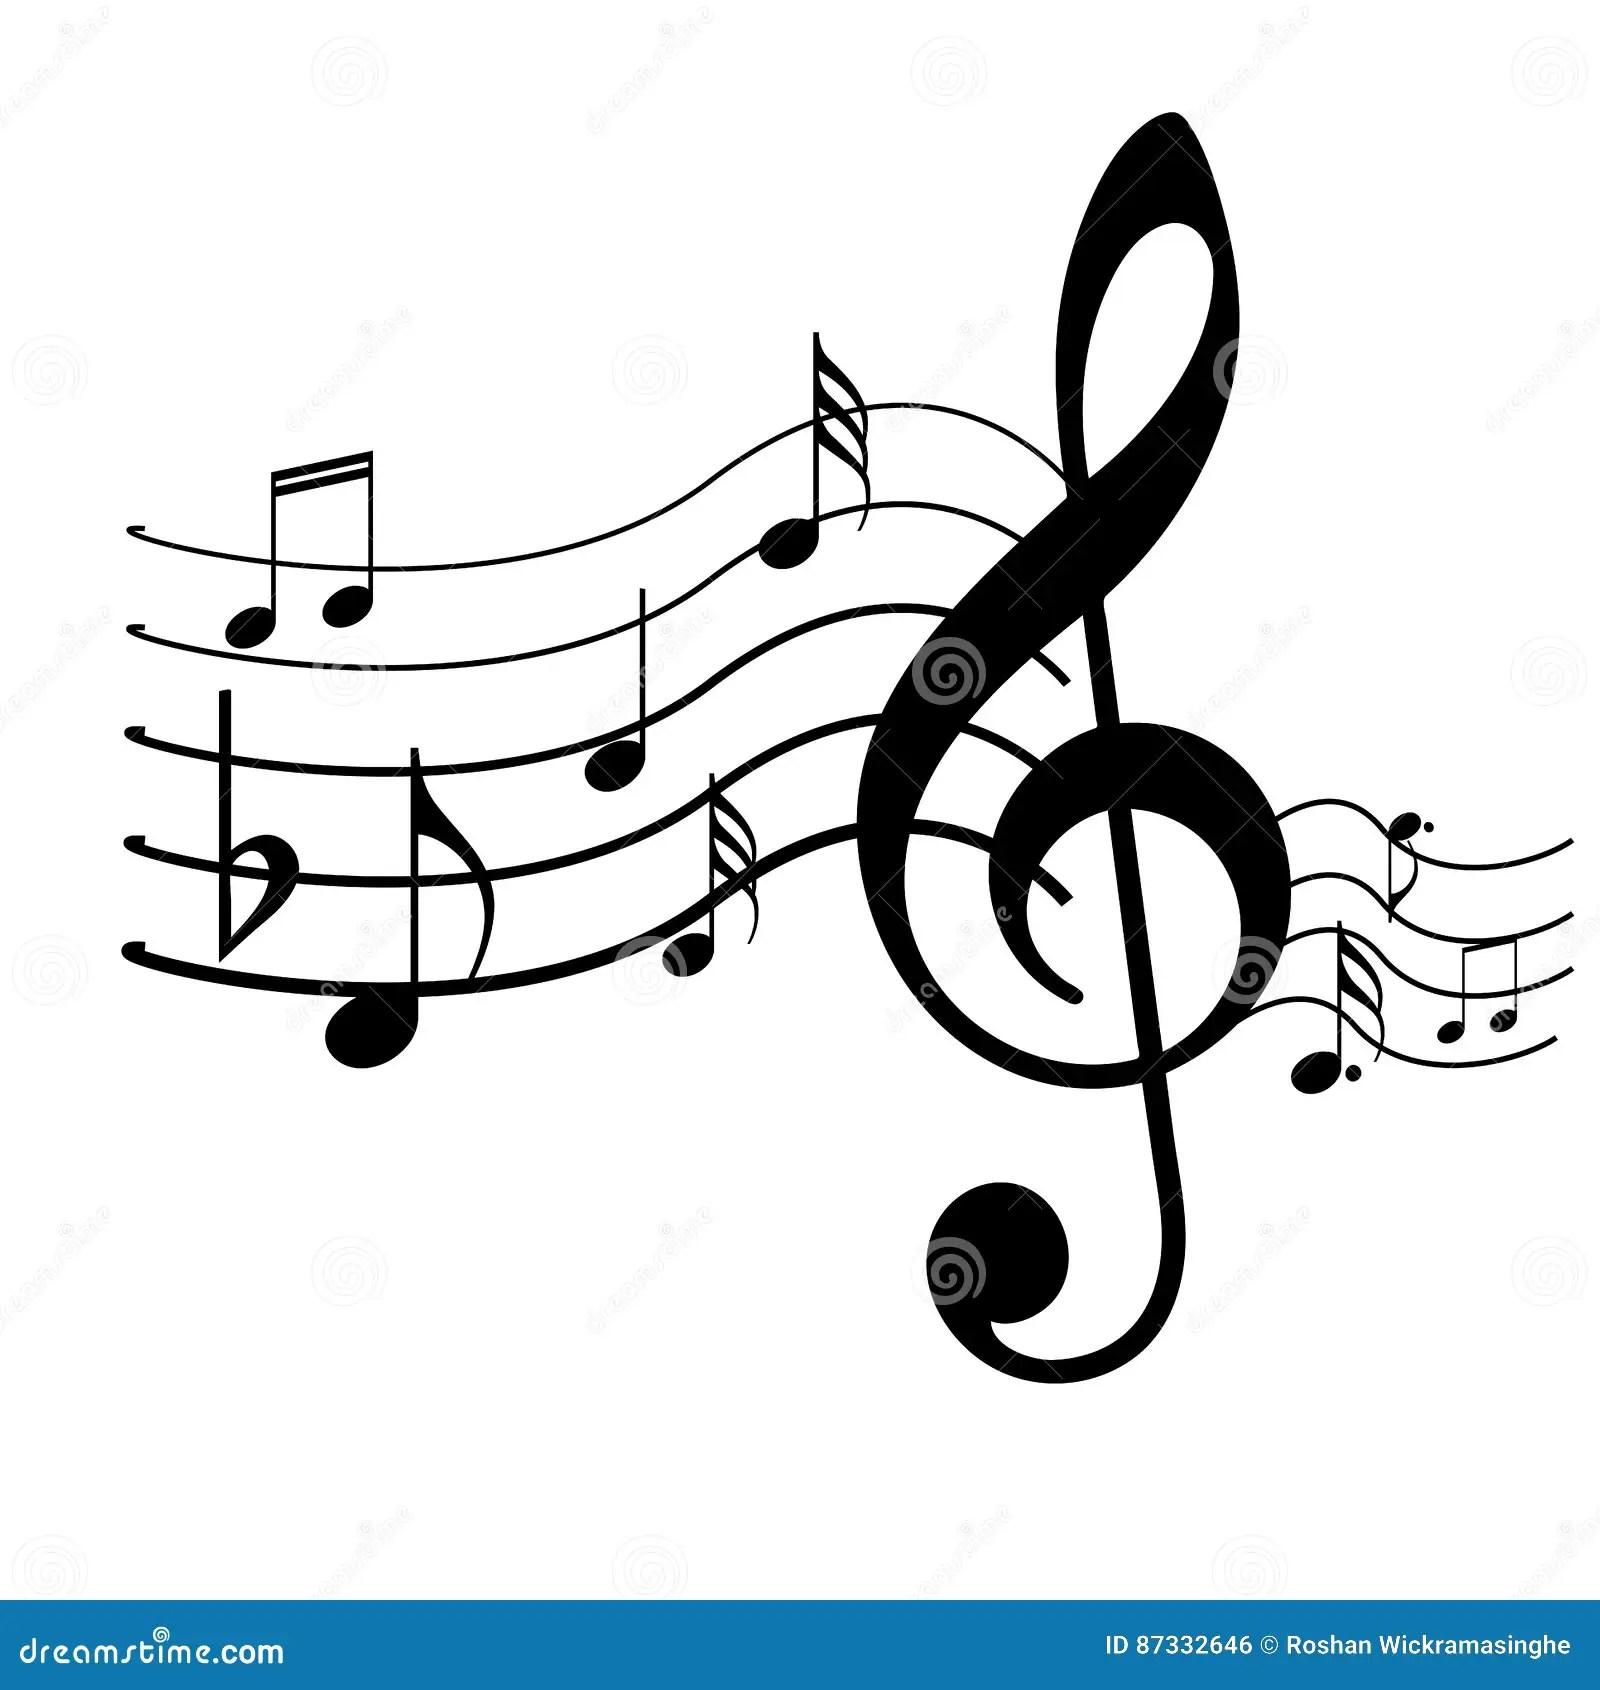 Music symbols design stock vector. Illustration of bars